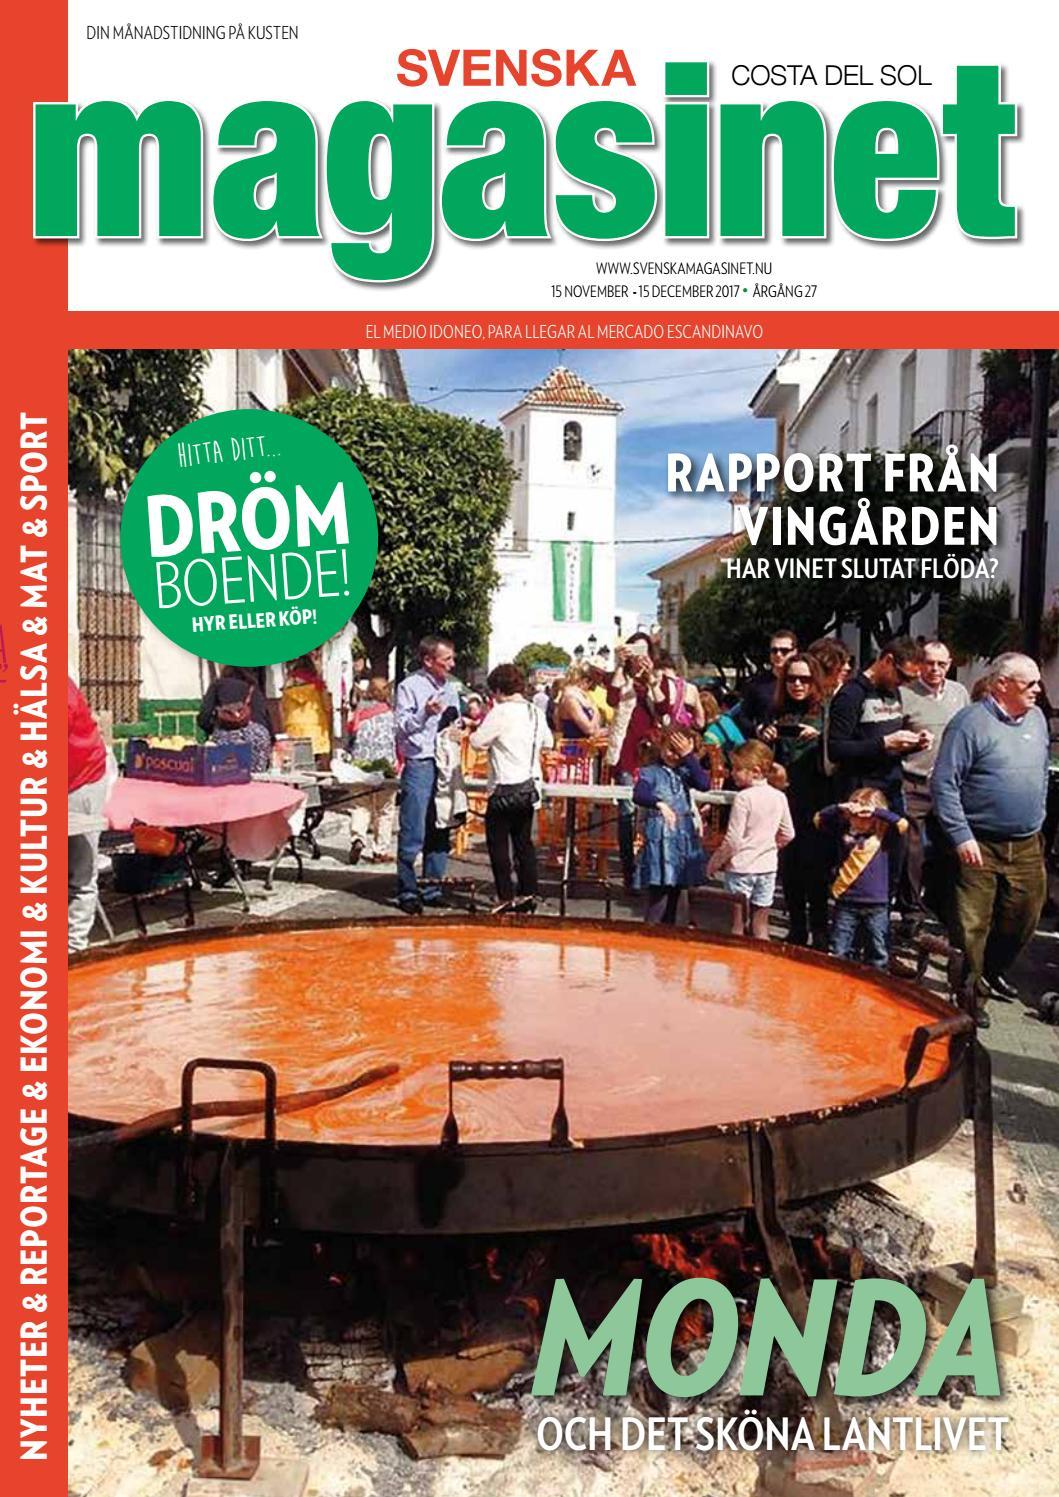 Bancone Bar Per Casa nov 2017 by svenska magasinet, spanien - issuu